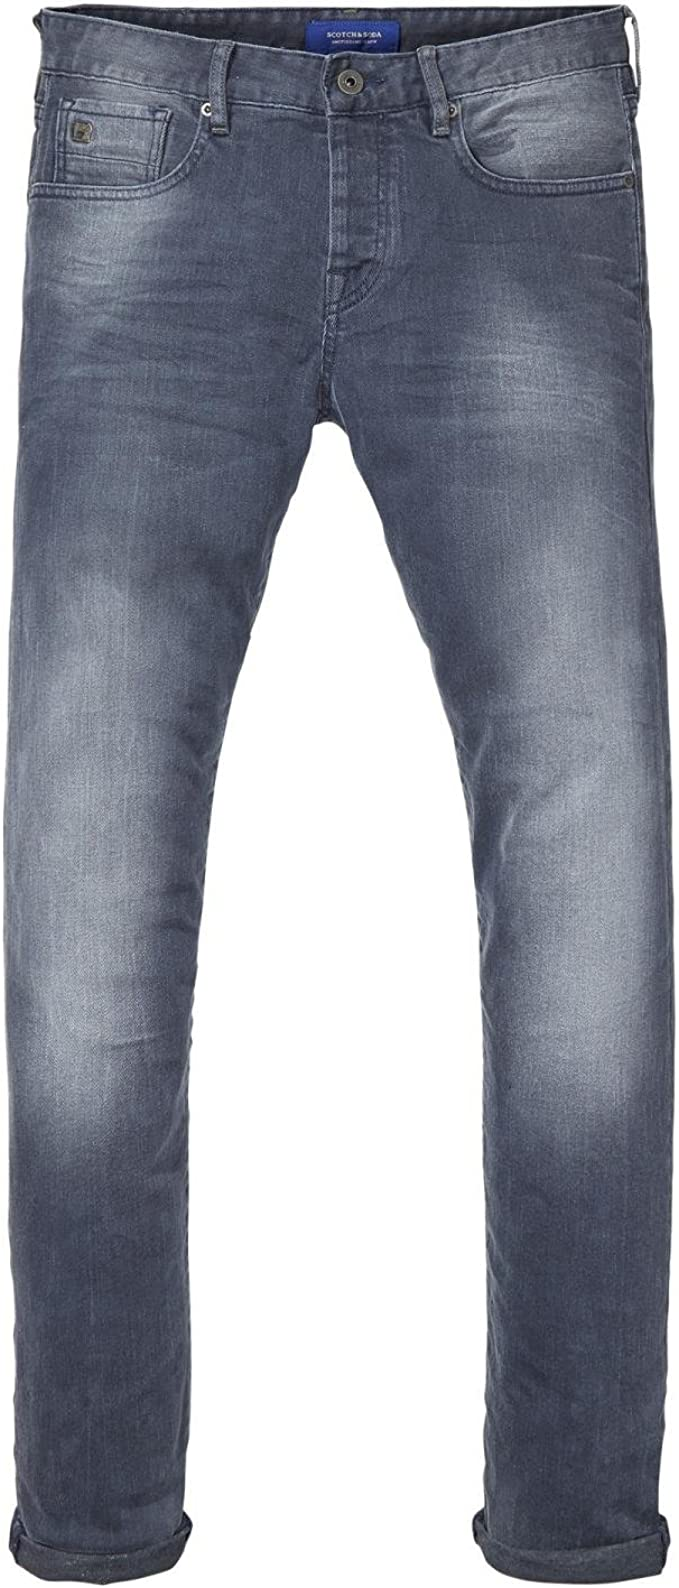 Scotch /& Soda Ralston-Shooting Star Jeans para Hombre